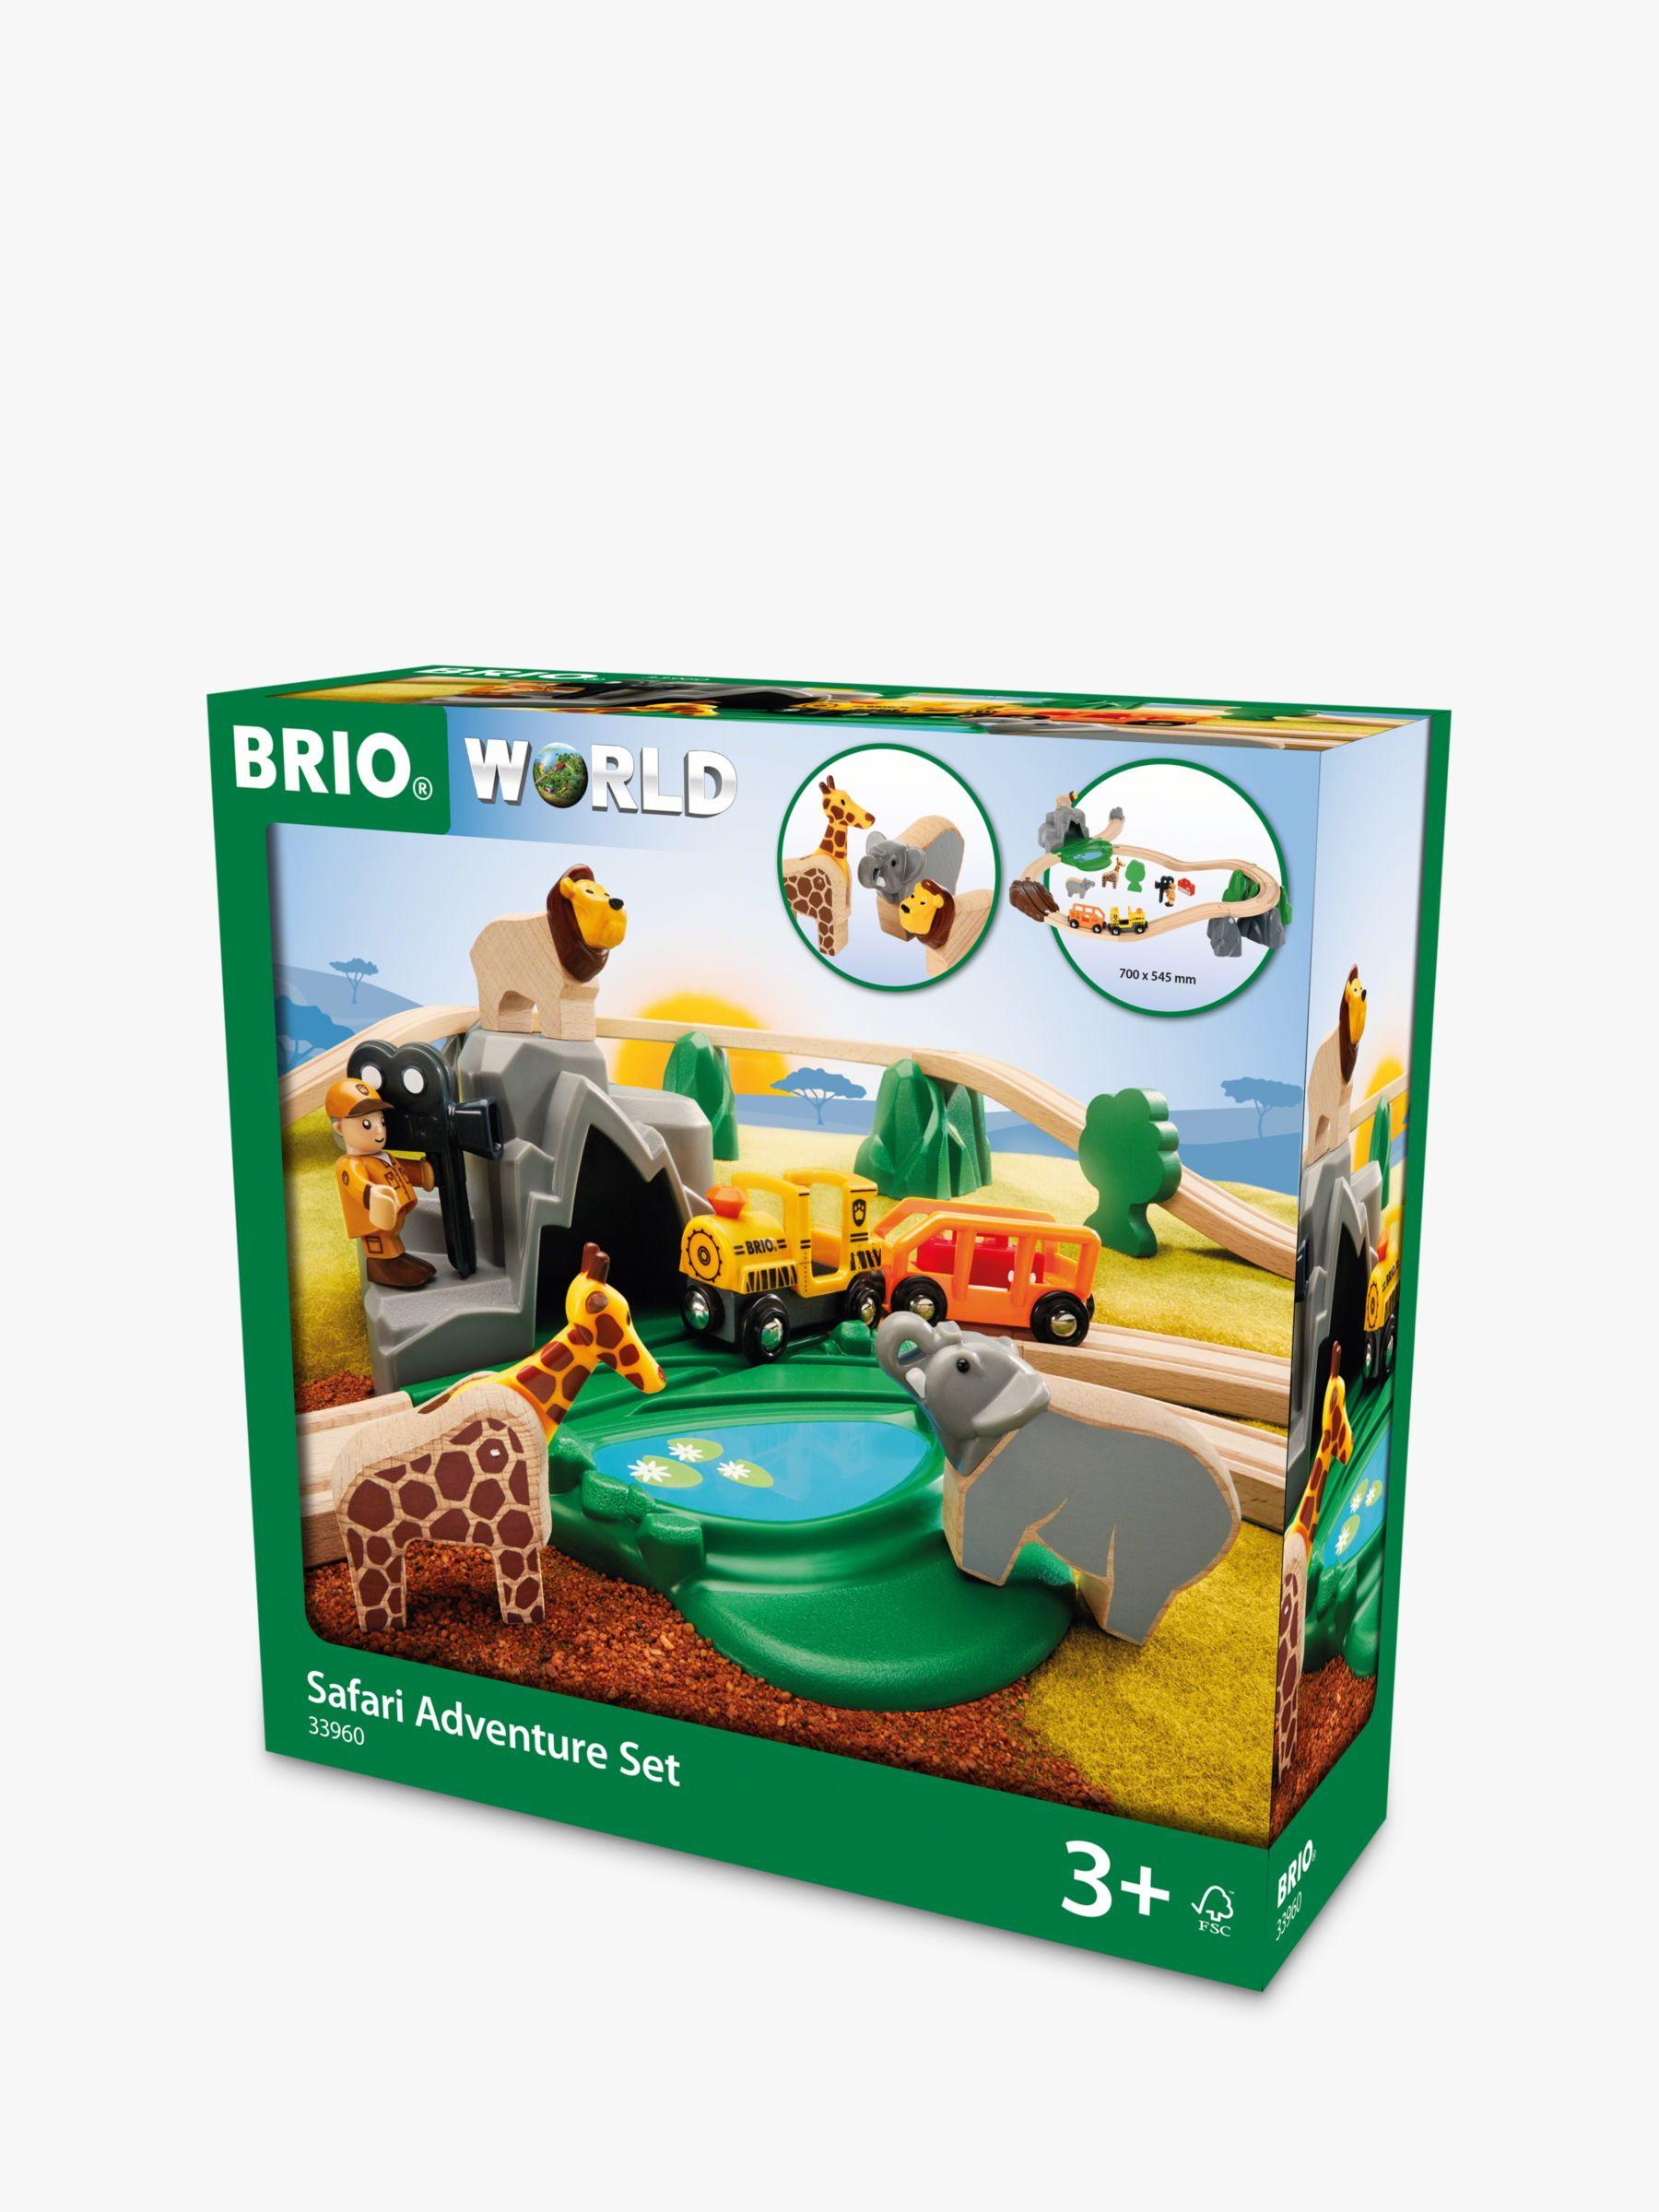 BRIO BRIO Wooden Safari Adventure Set